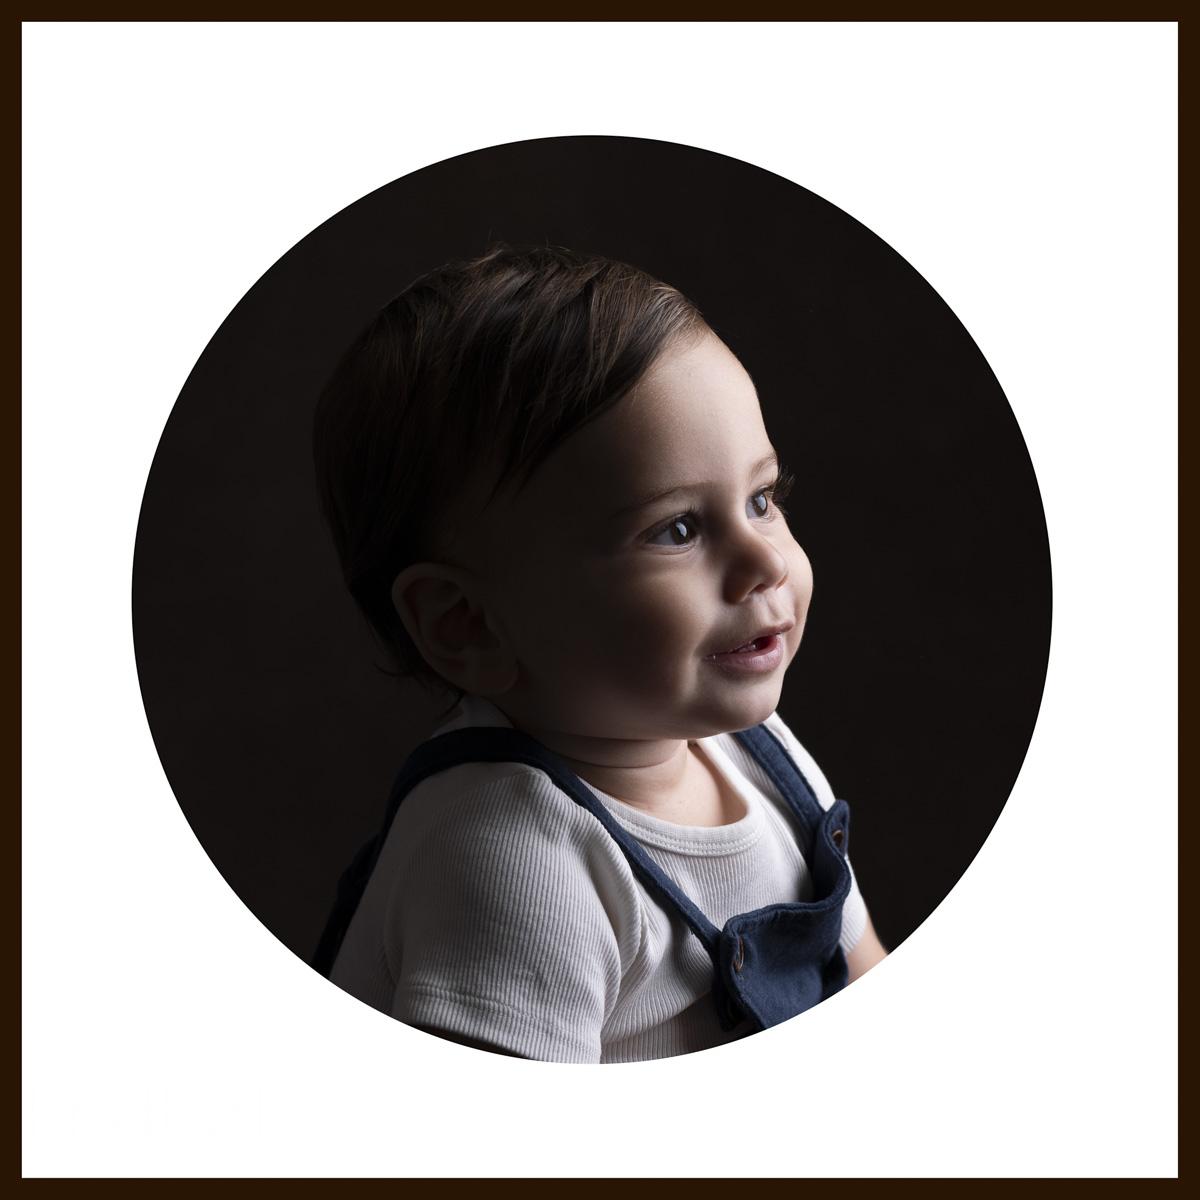 babyfoto, 1-årsfoto, barnfotografering studio, tullinge, fotograf stockholm